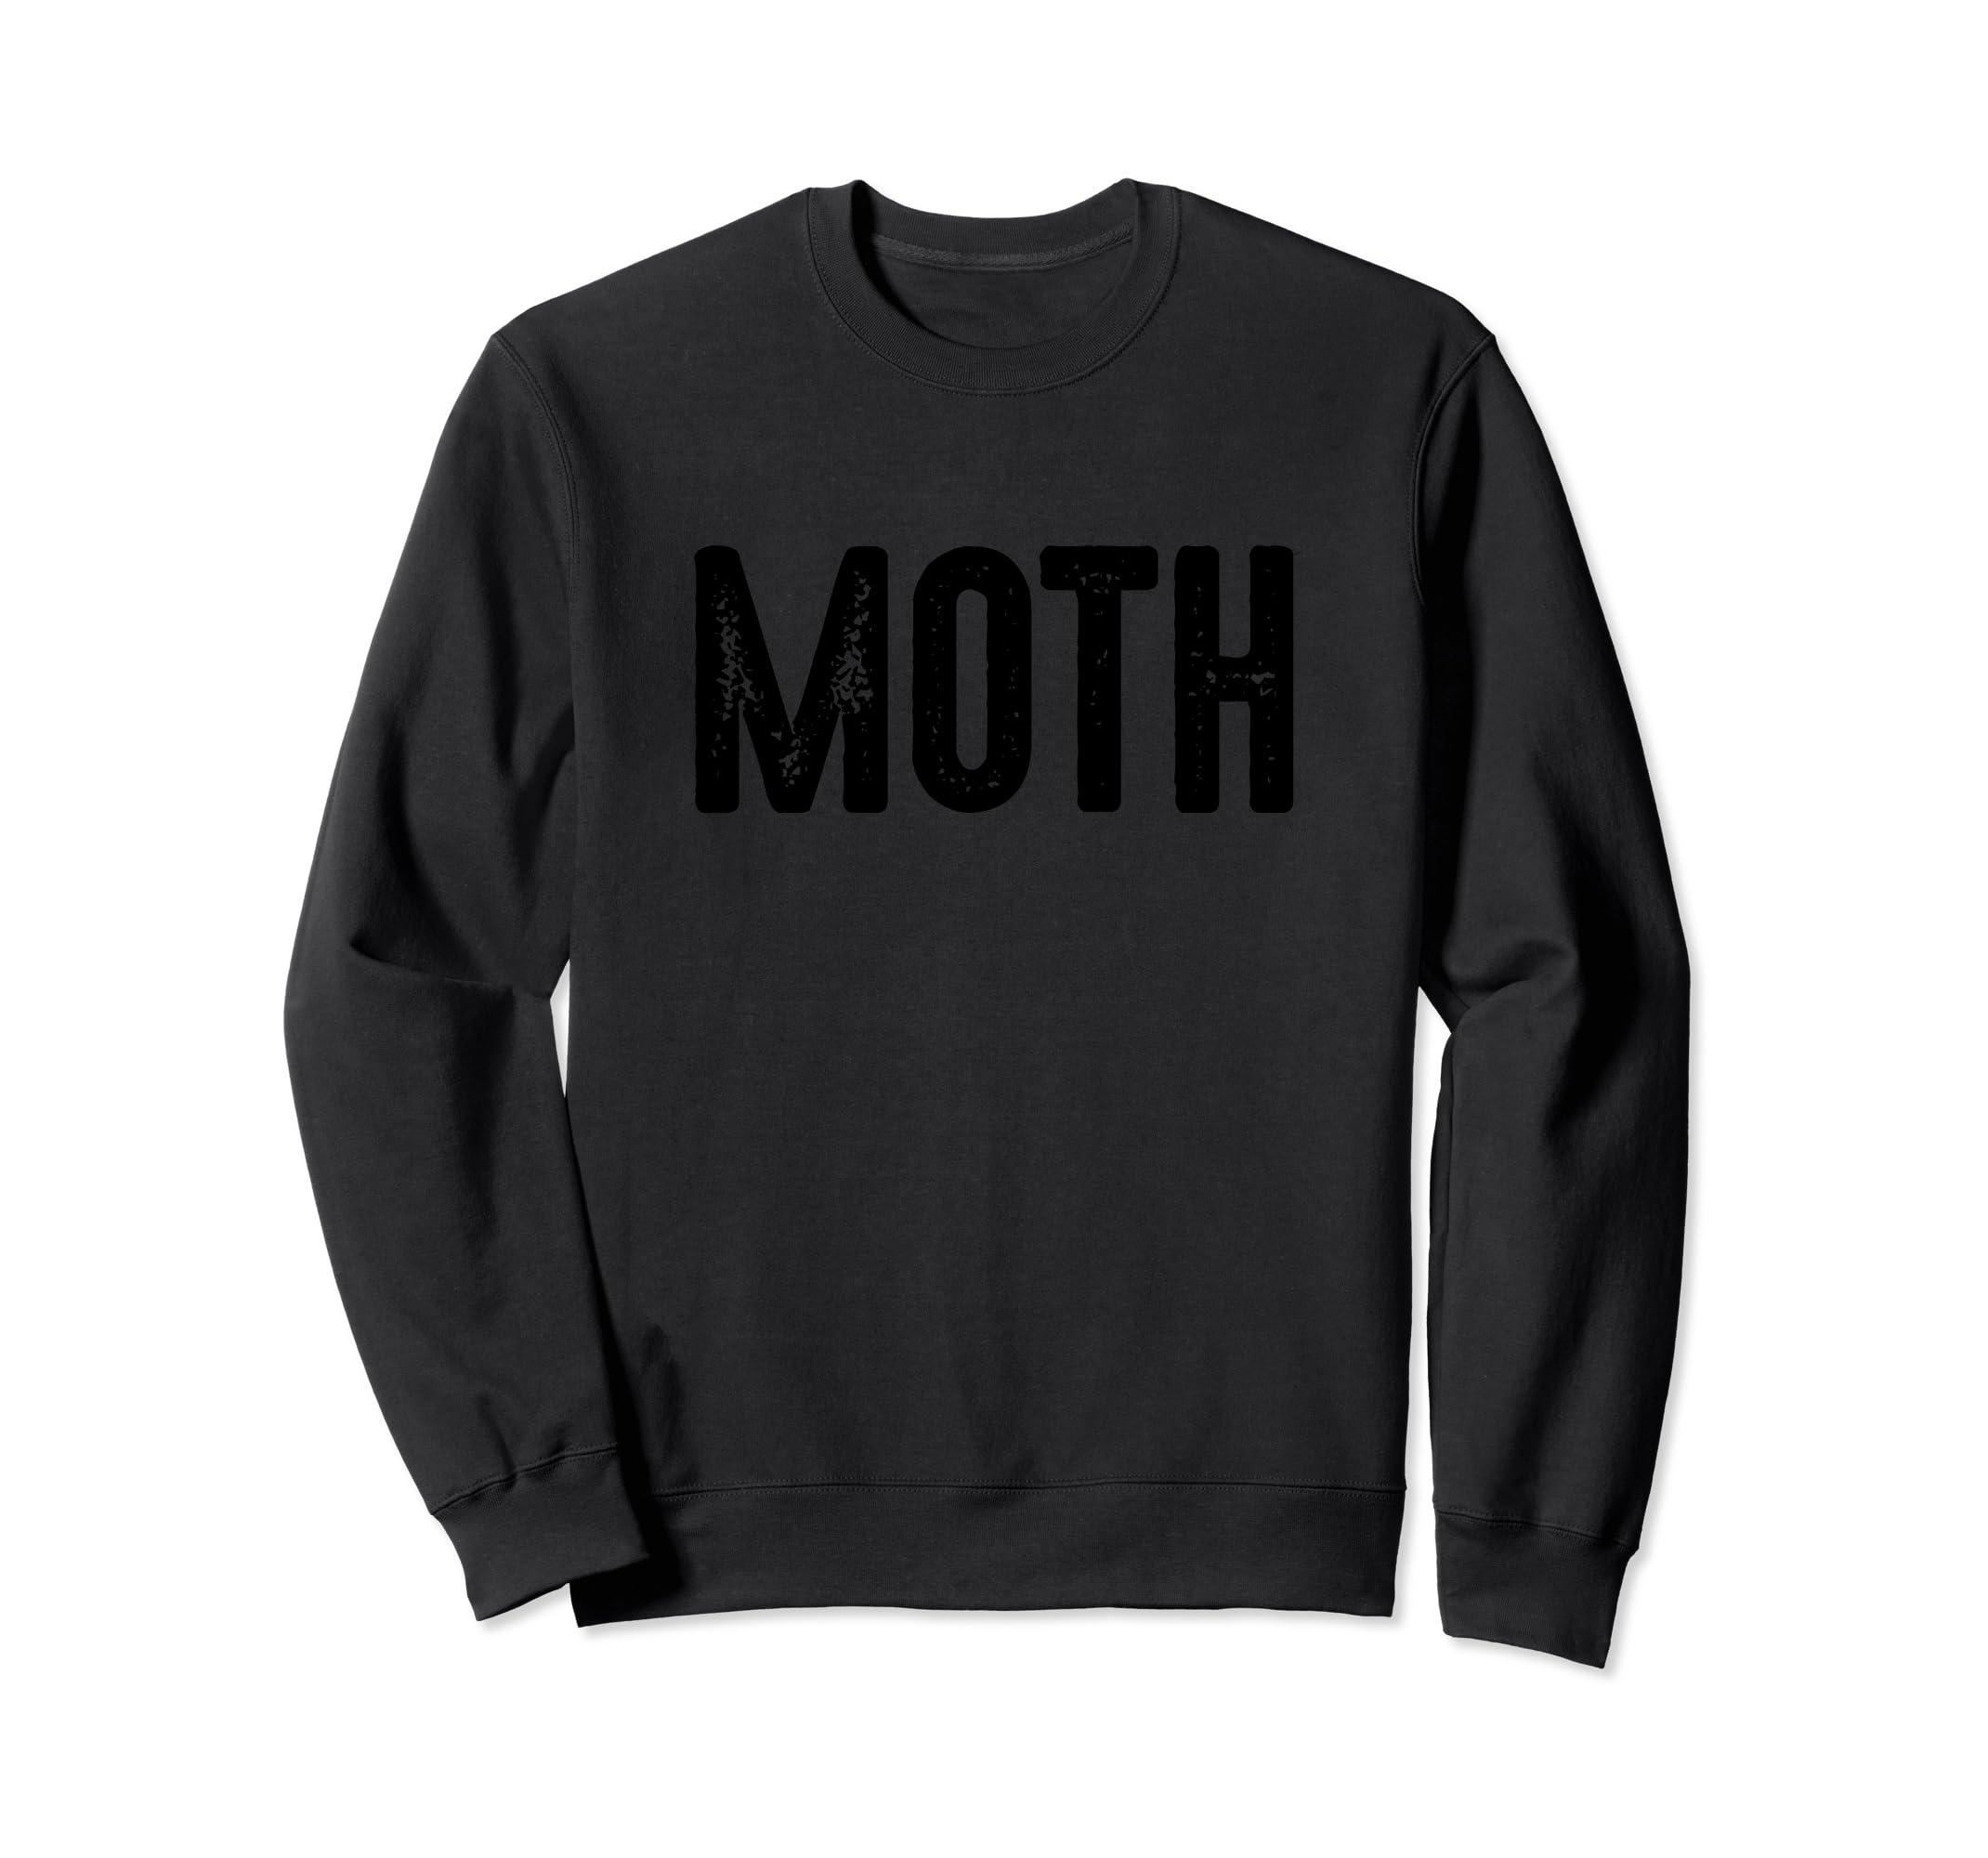 9e619fd8a Amazon.com: Funny Moth Meme Sweatshirt Christmas Halloween Costume Tee:  Clothing